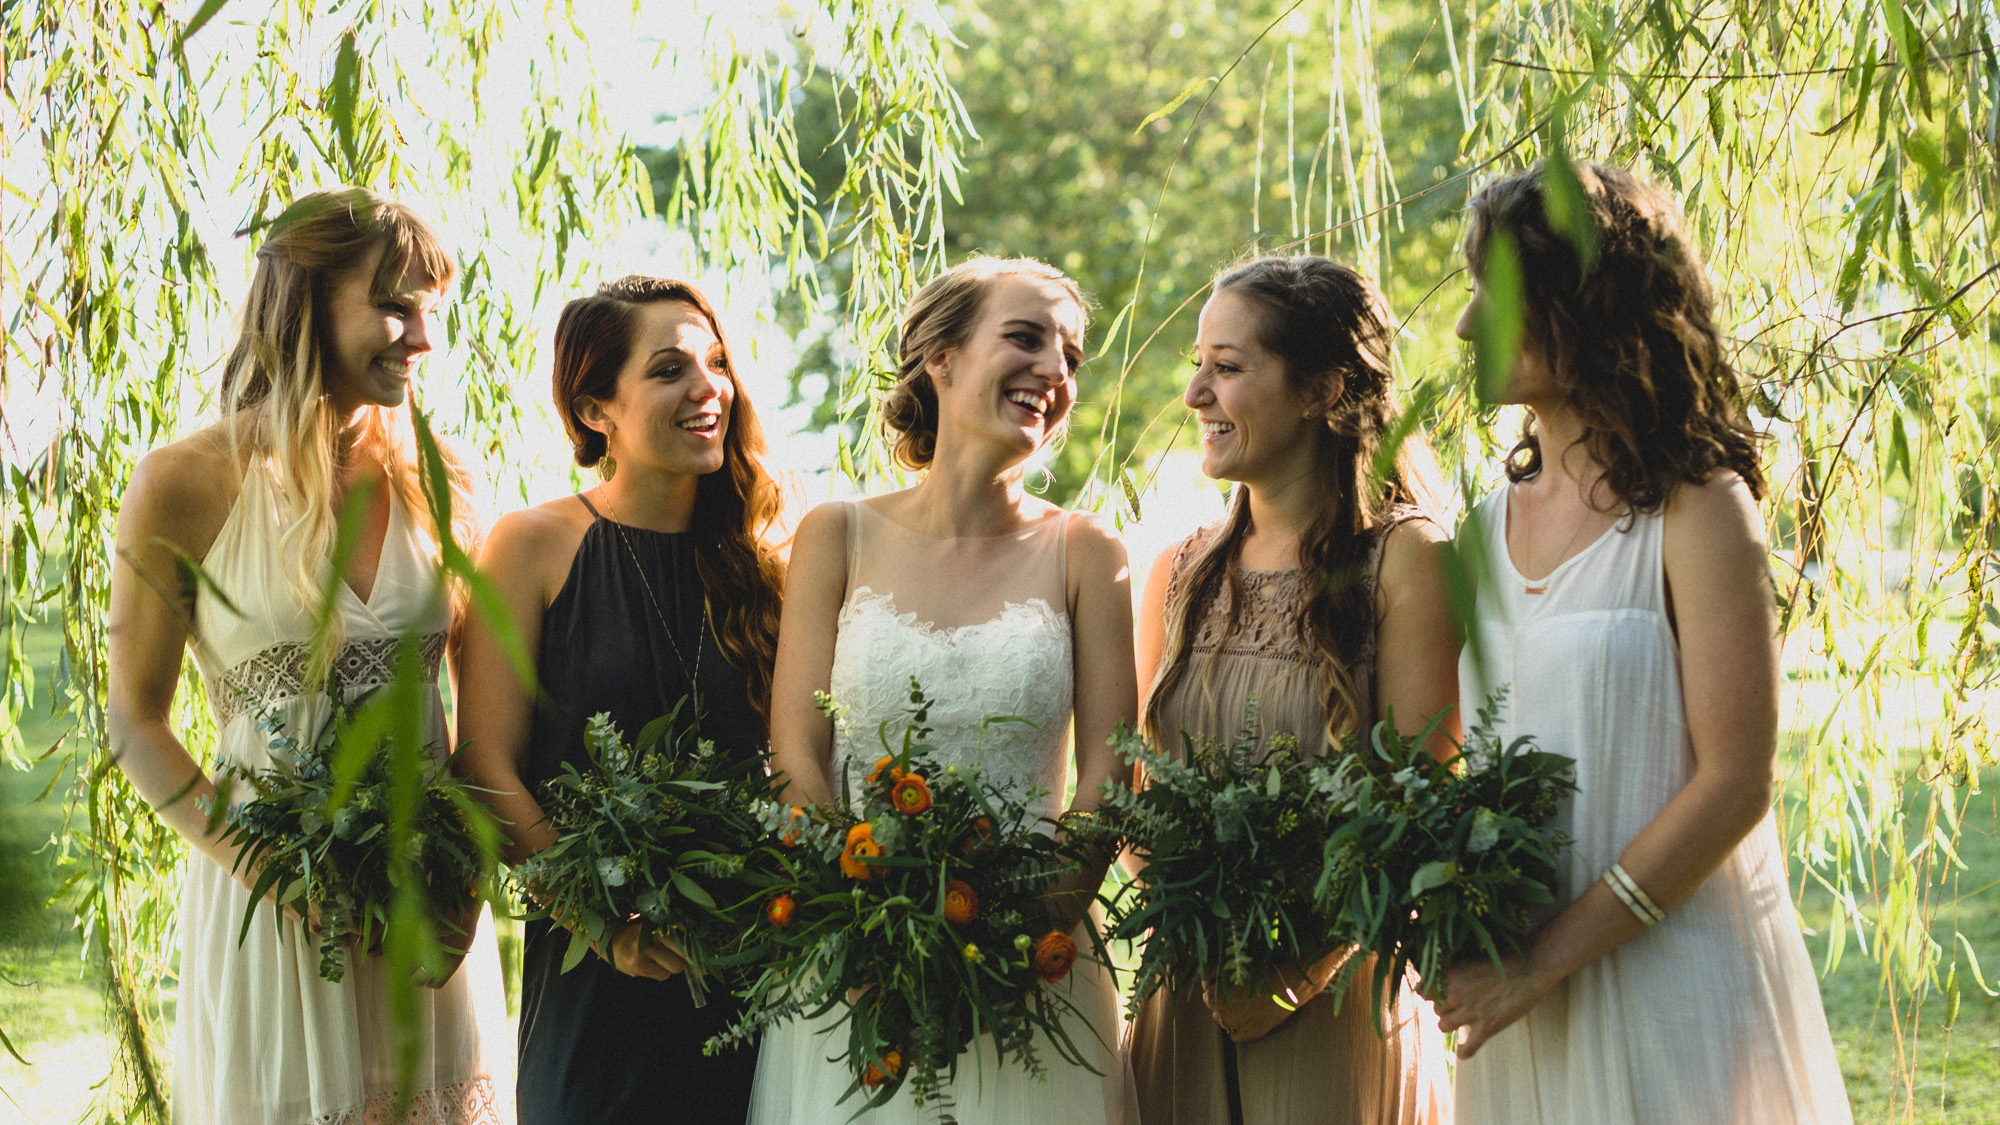 alec_vanderboom_springfield_missouri_wedding-0059.jpg